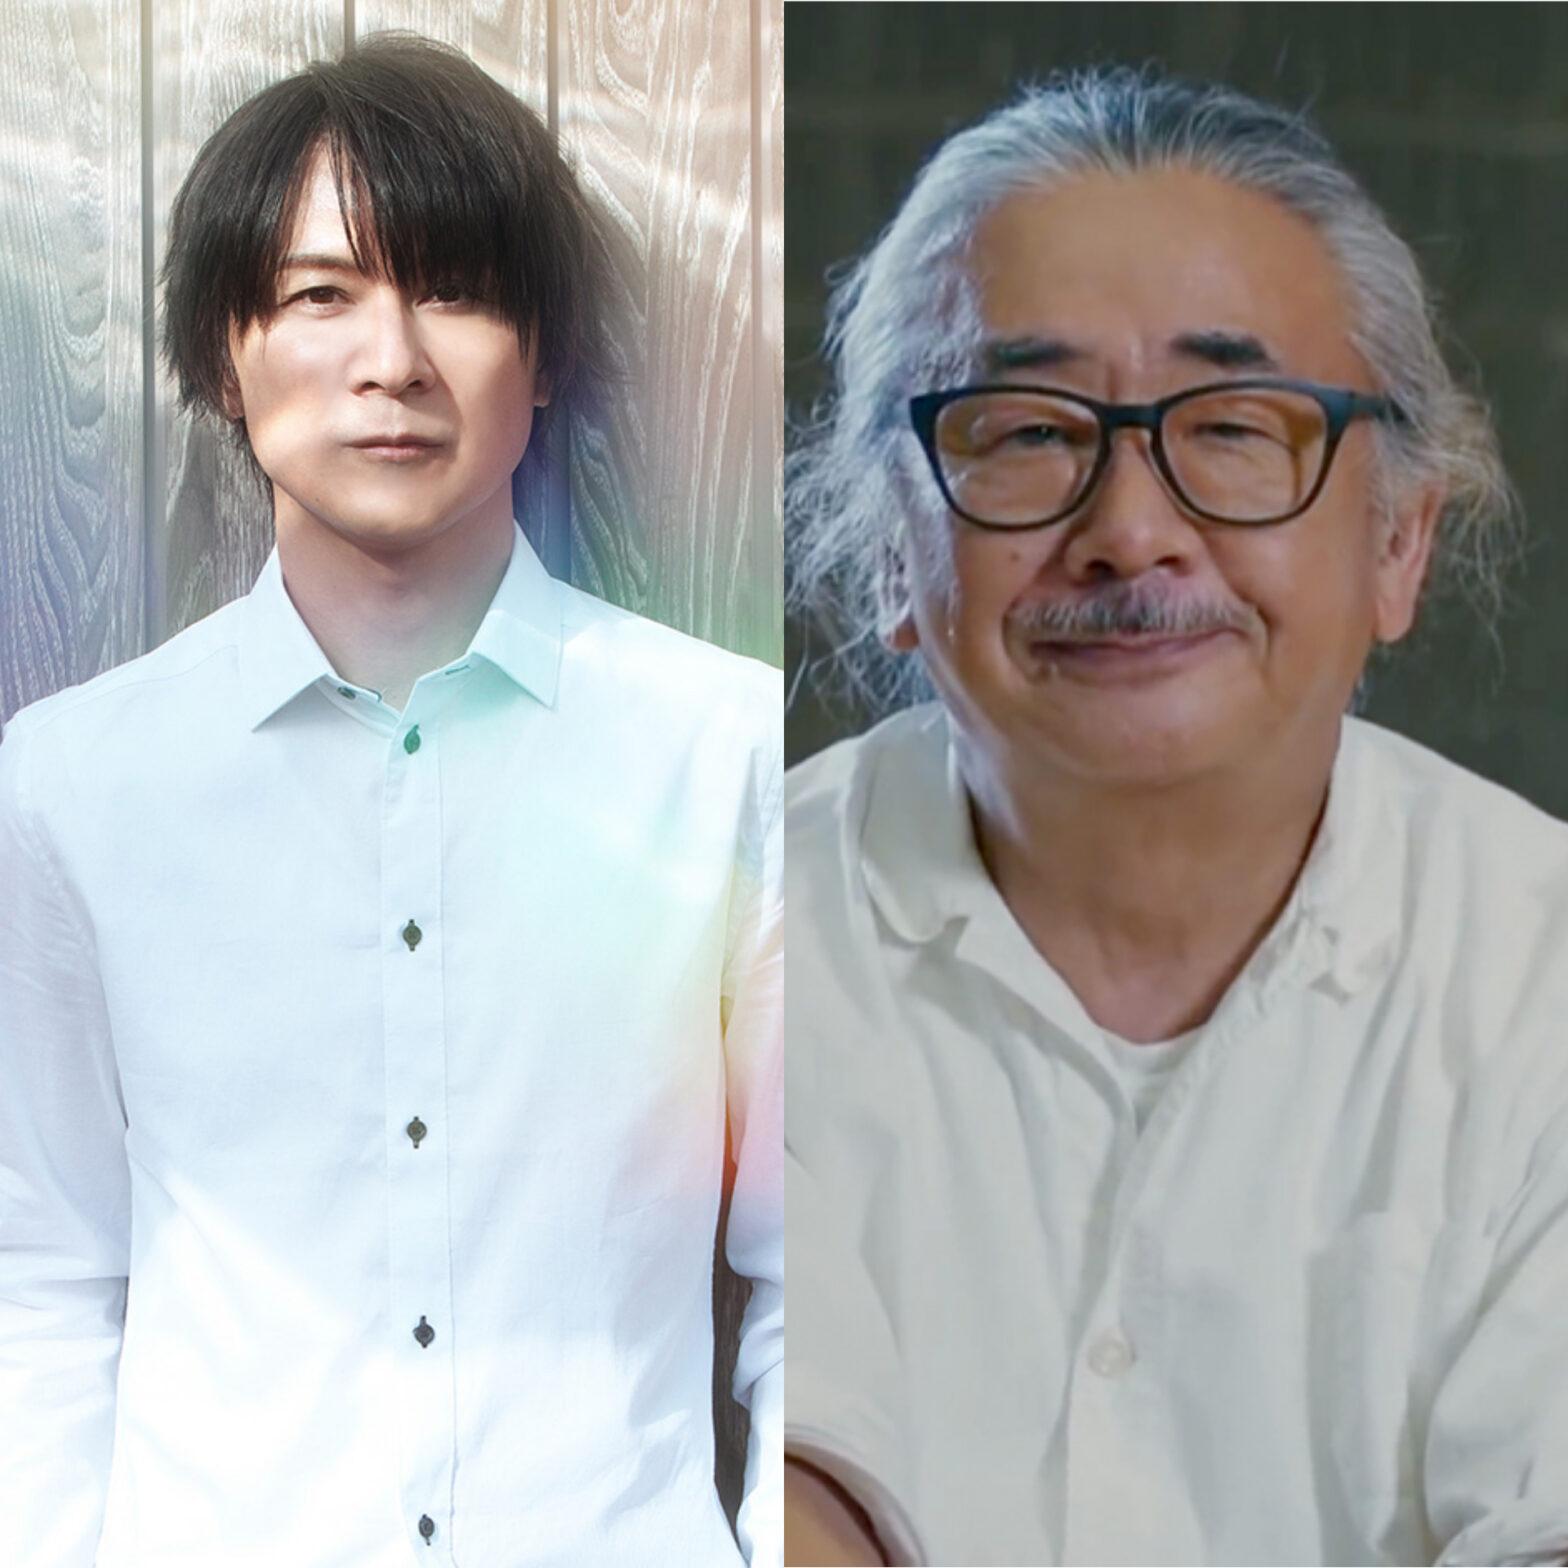 JRPG Songs Mitsuda and Uematsu